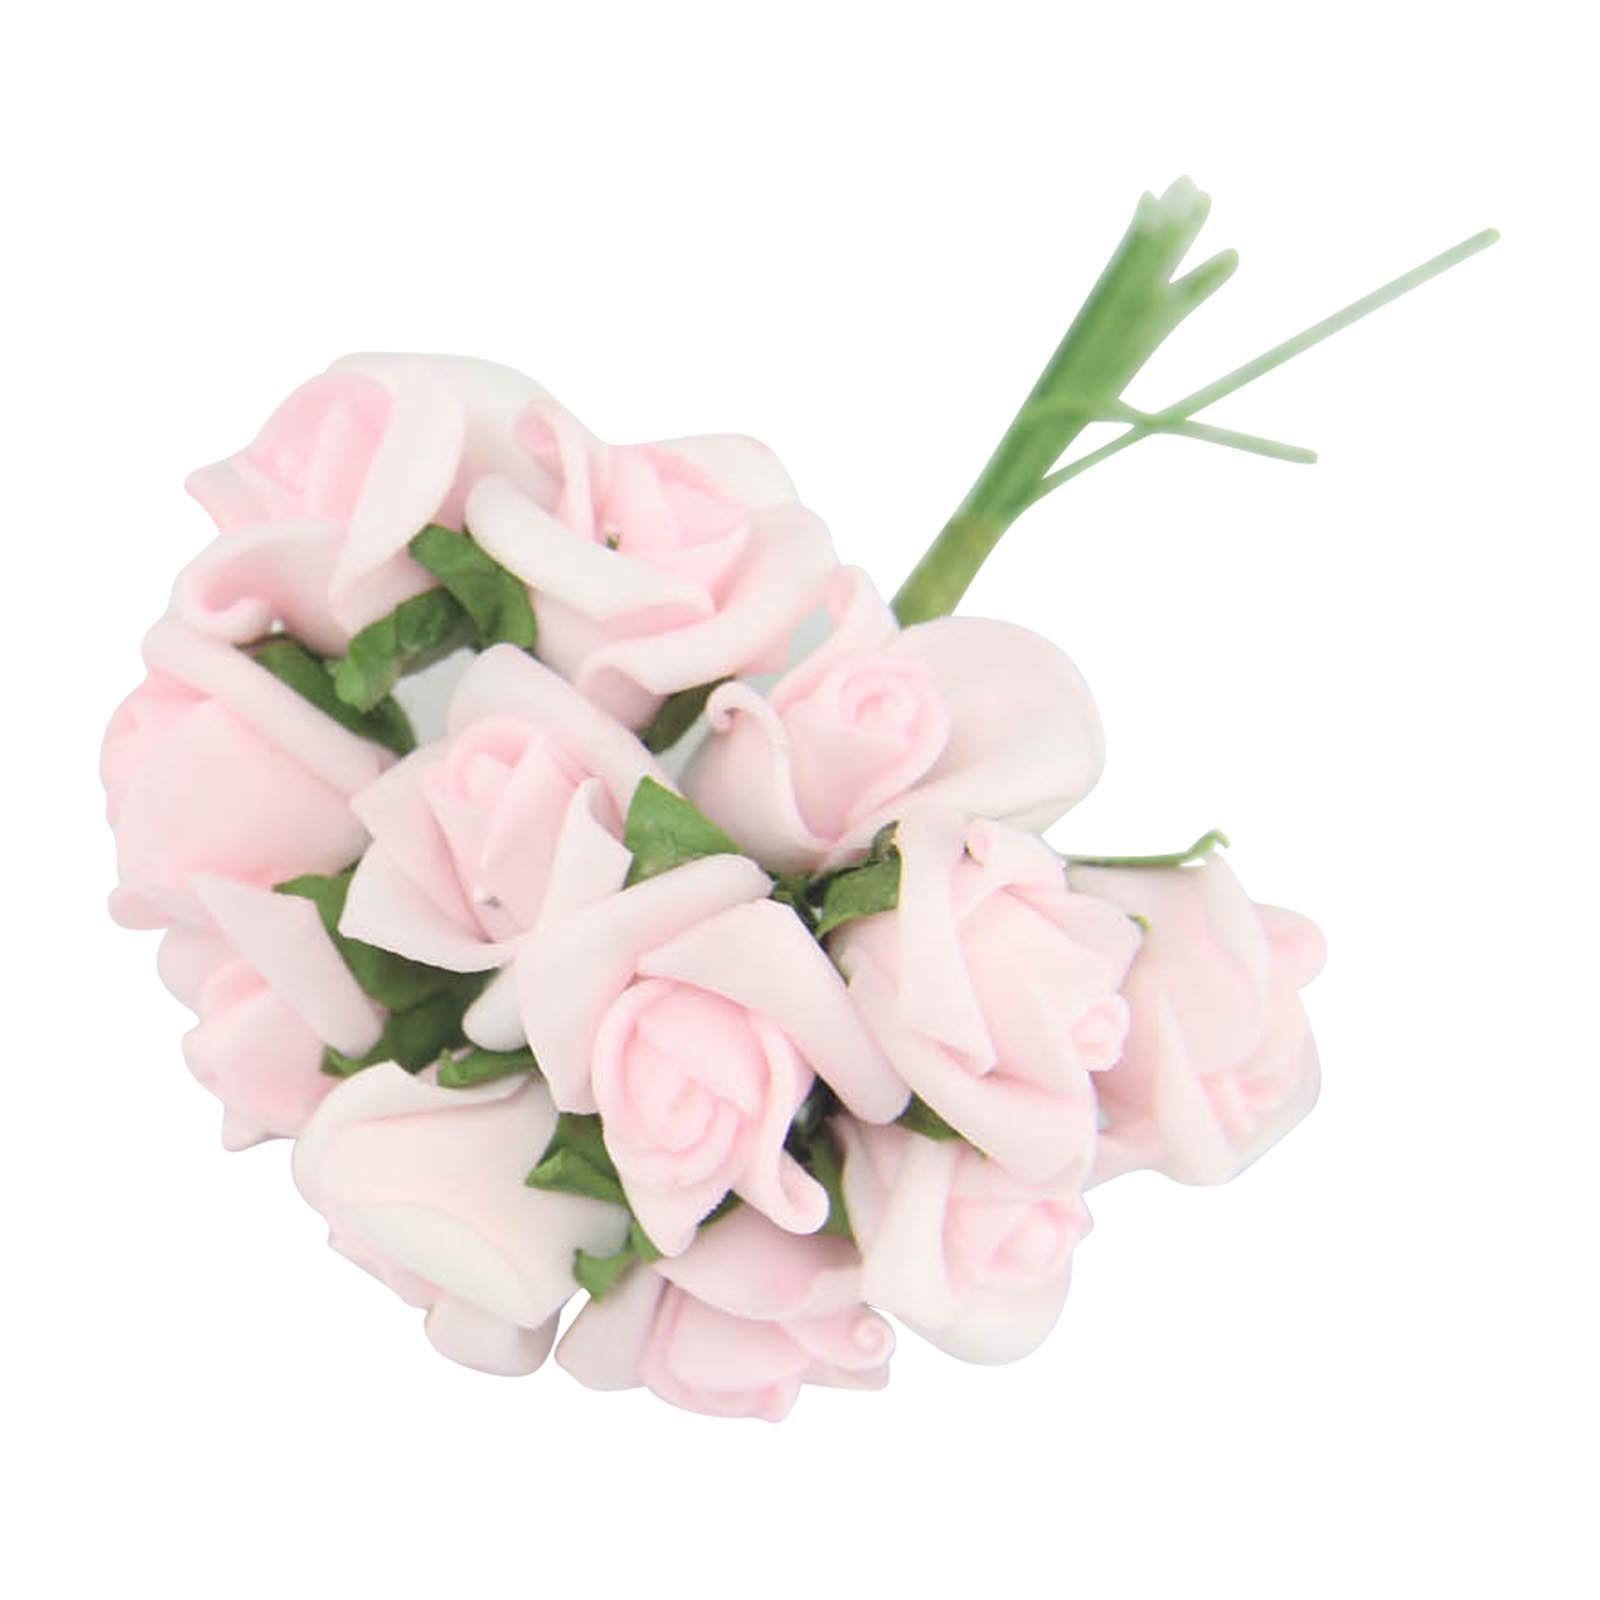 Bundles of 12 Mini Foam Rose Bunches Bulk Wholesale Artificial Flowers Craft